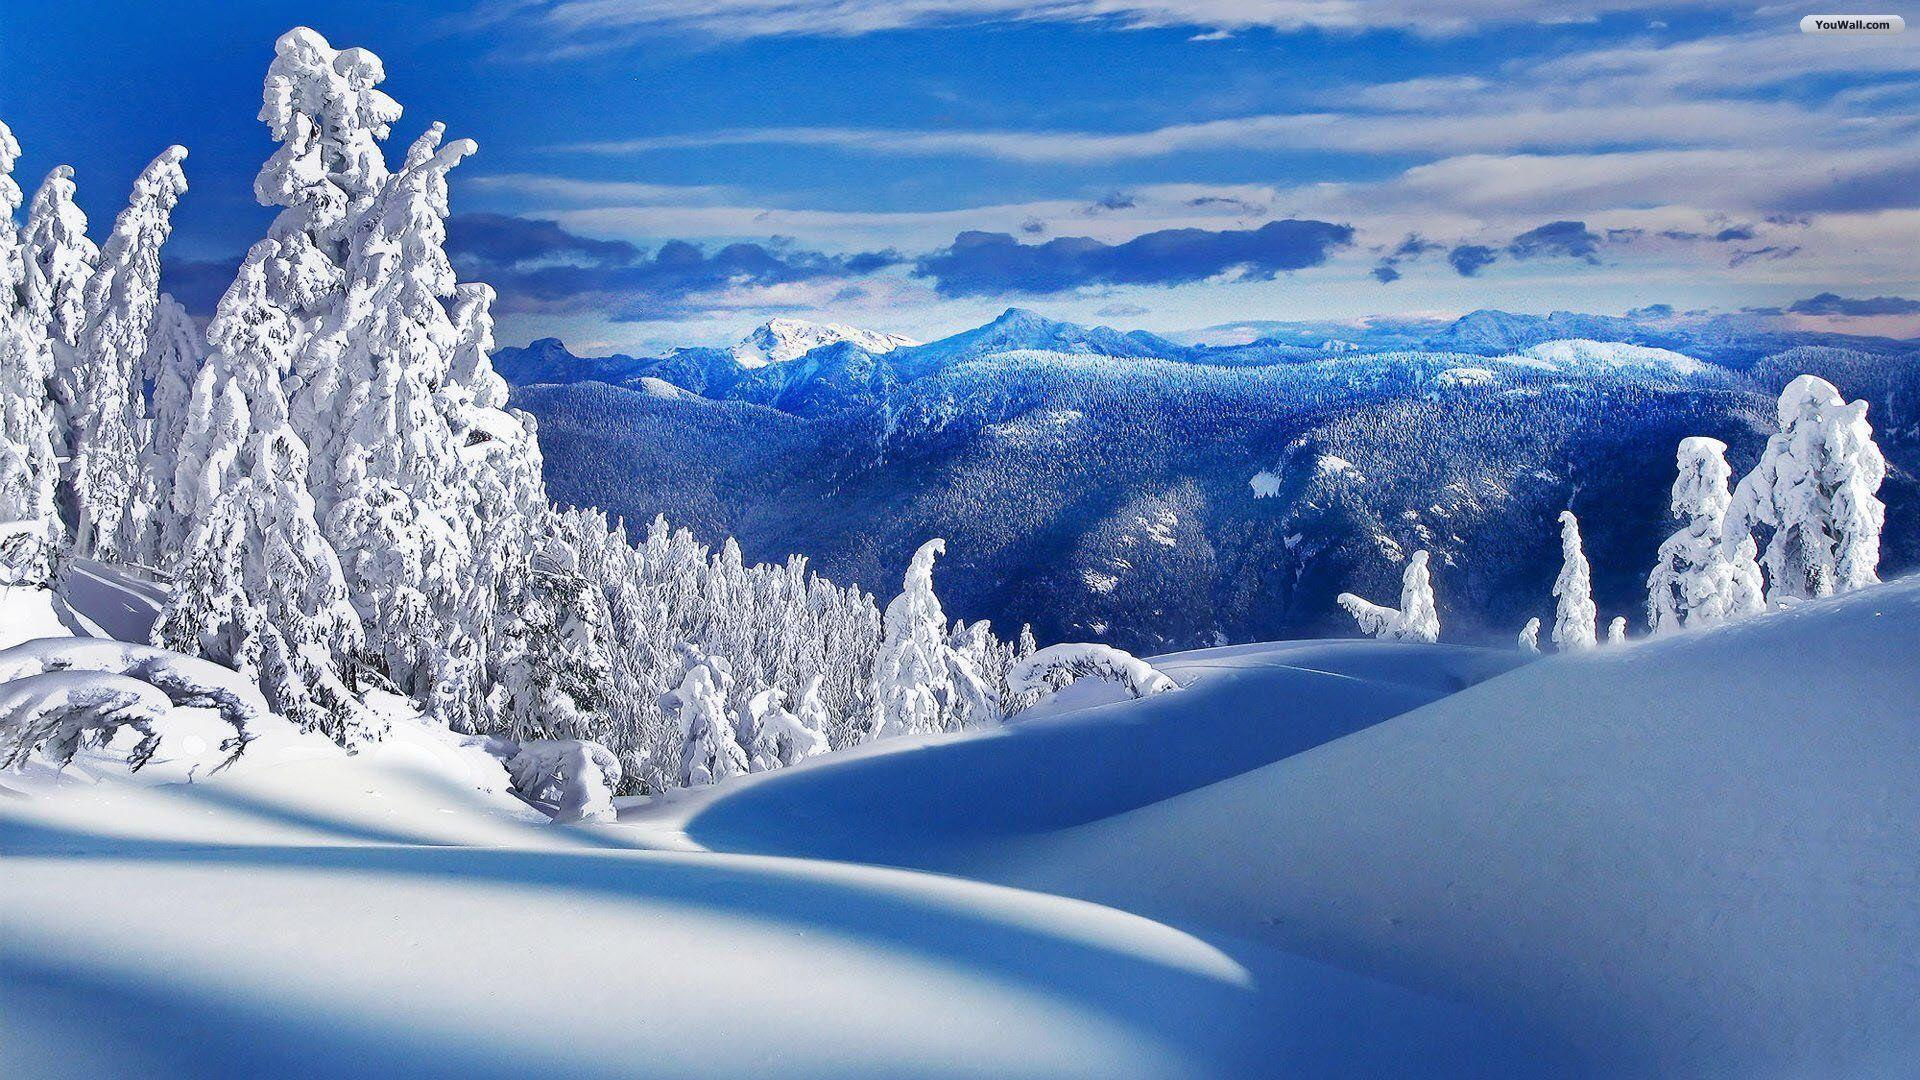 Winter Landscapes Wallpapers Wallpaper Cave